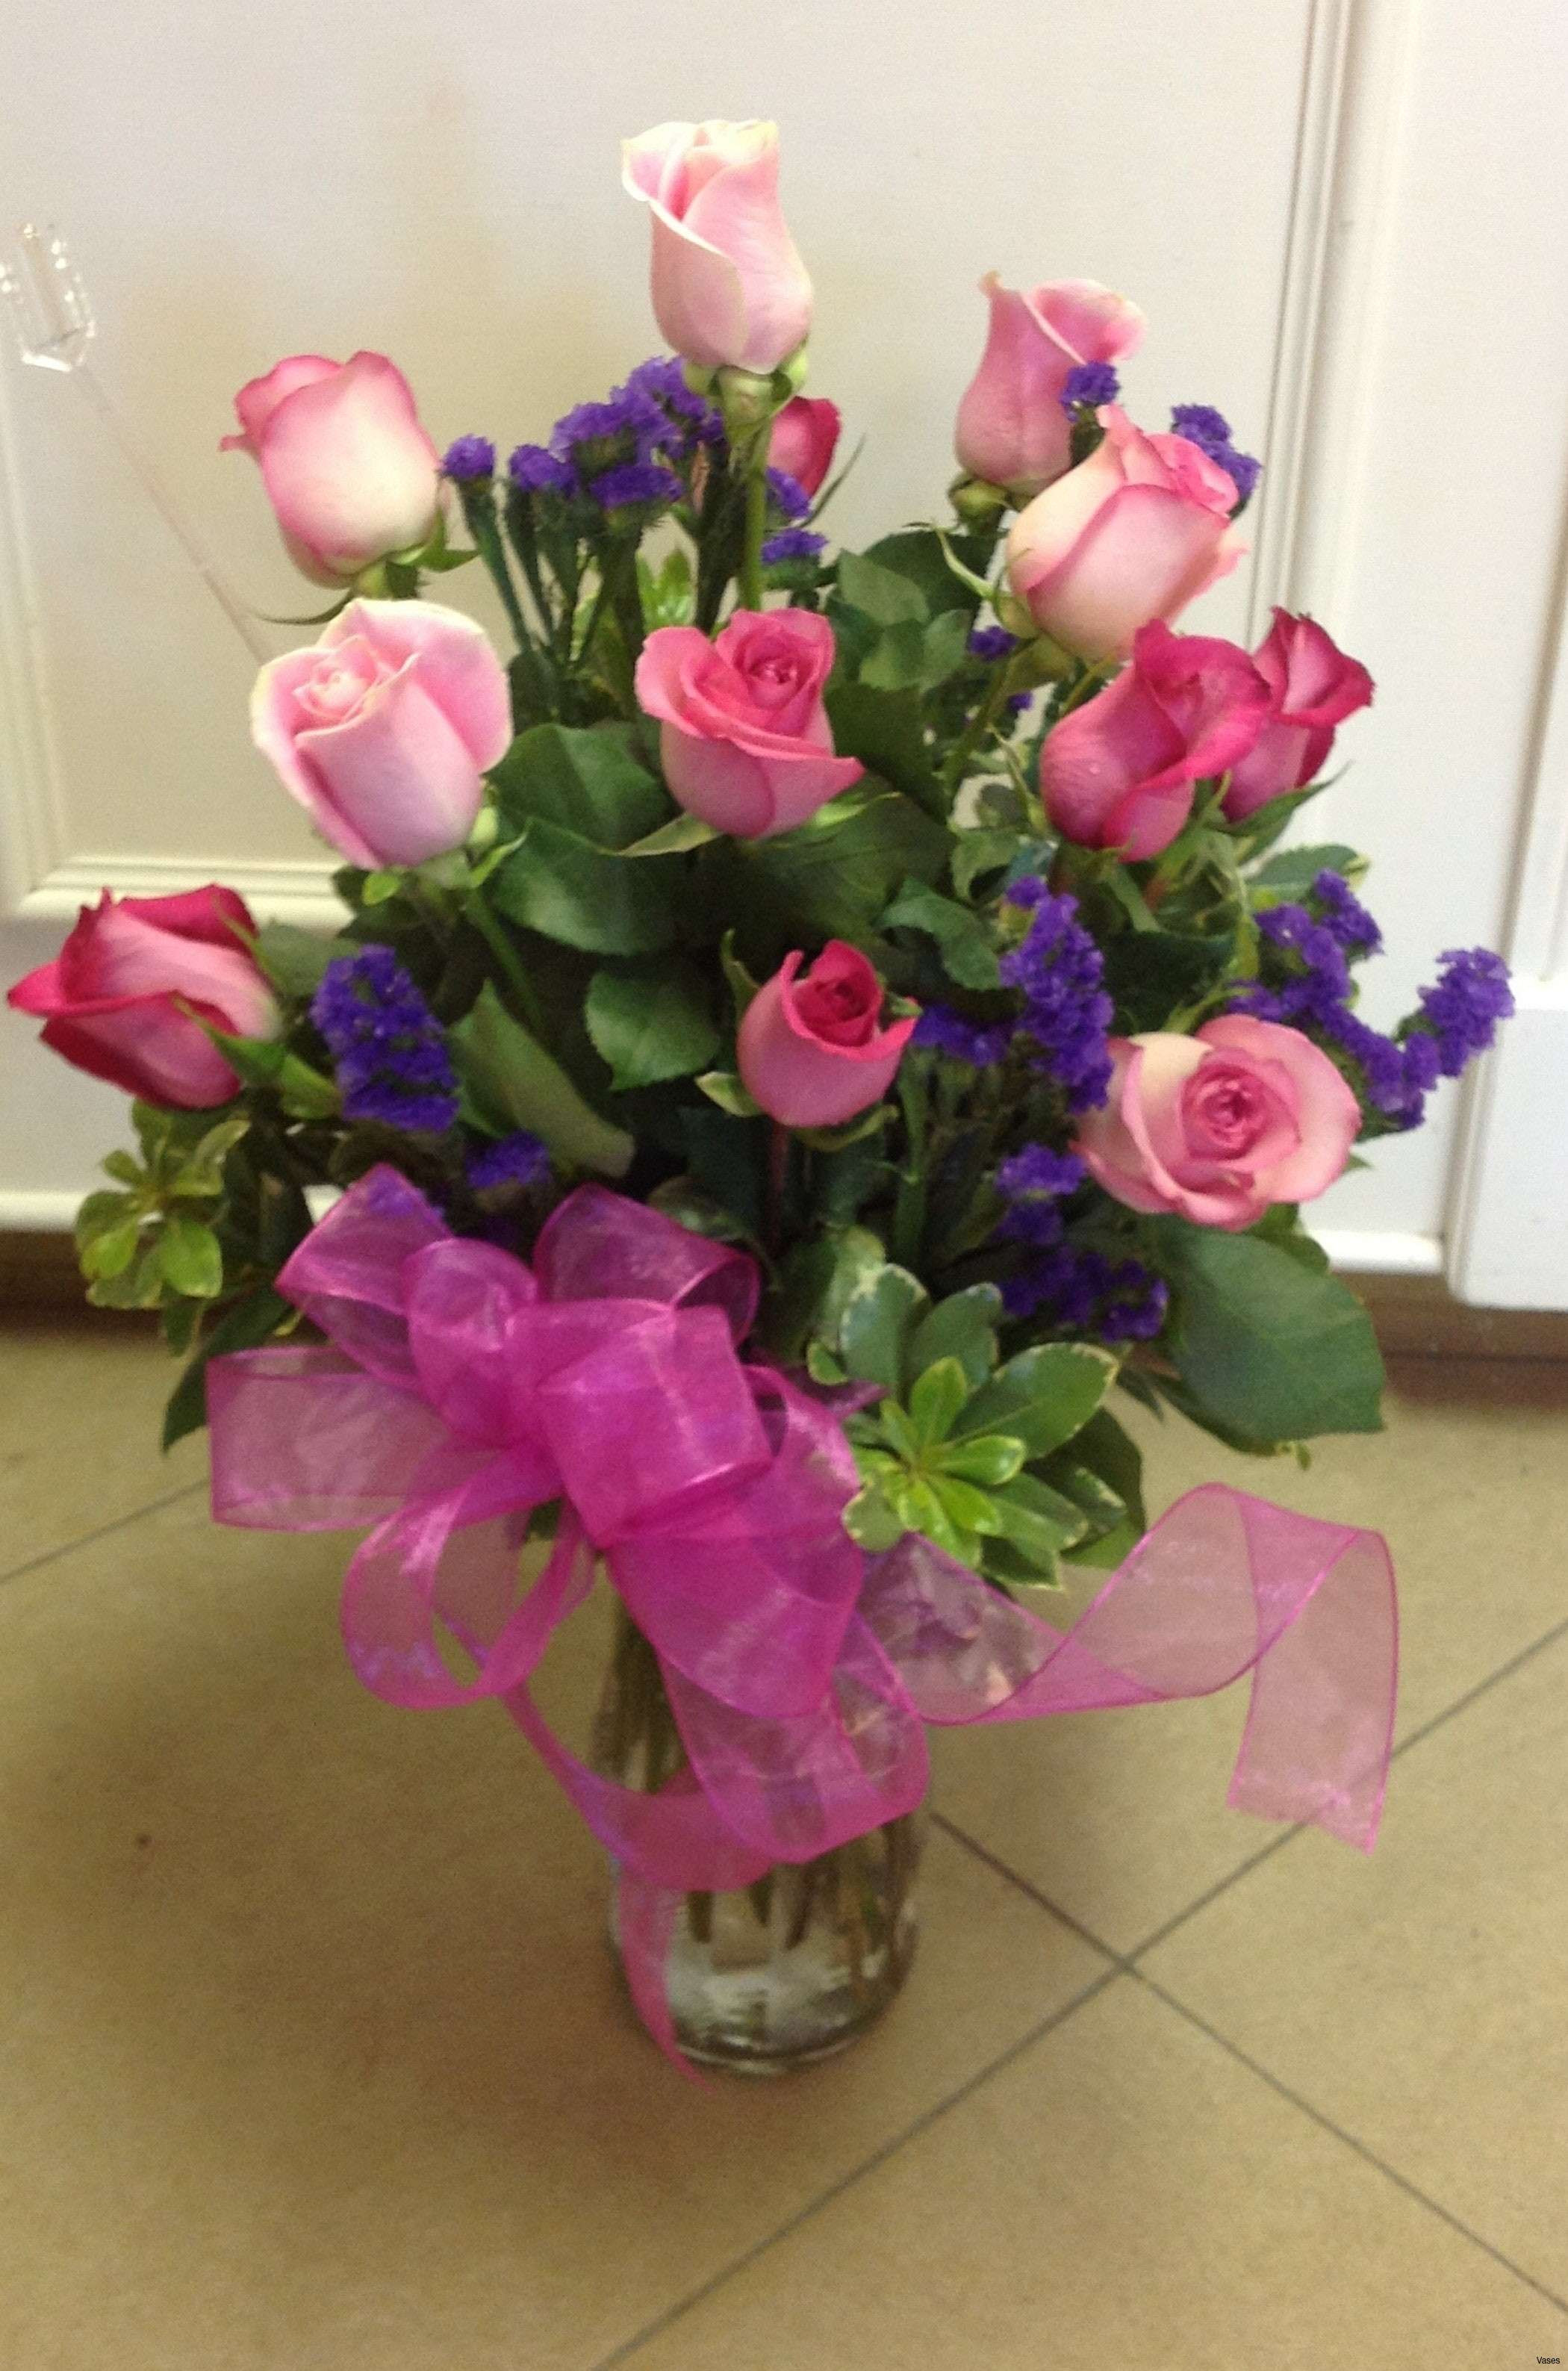 square glass vases wholesale of 15 cheap and easy diy vase filler ideas 3h vases flower i 0d fillers with 15 cheap and easy diy vase filler ideas 3h vases flower i 0d fillers inspiration of